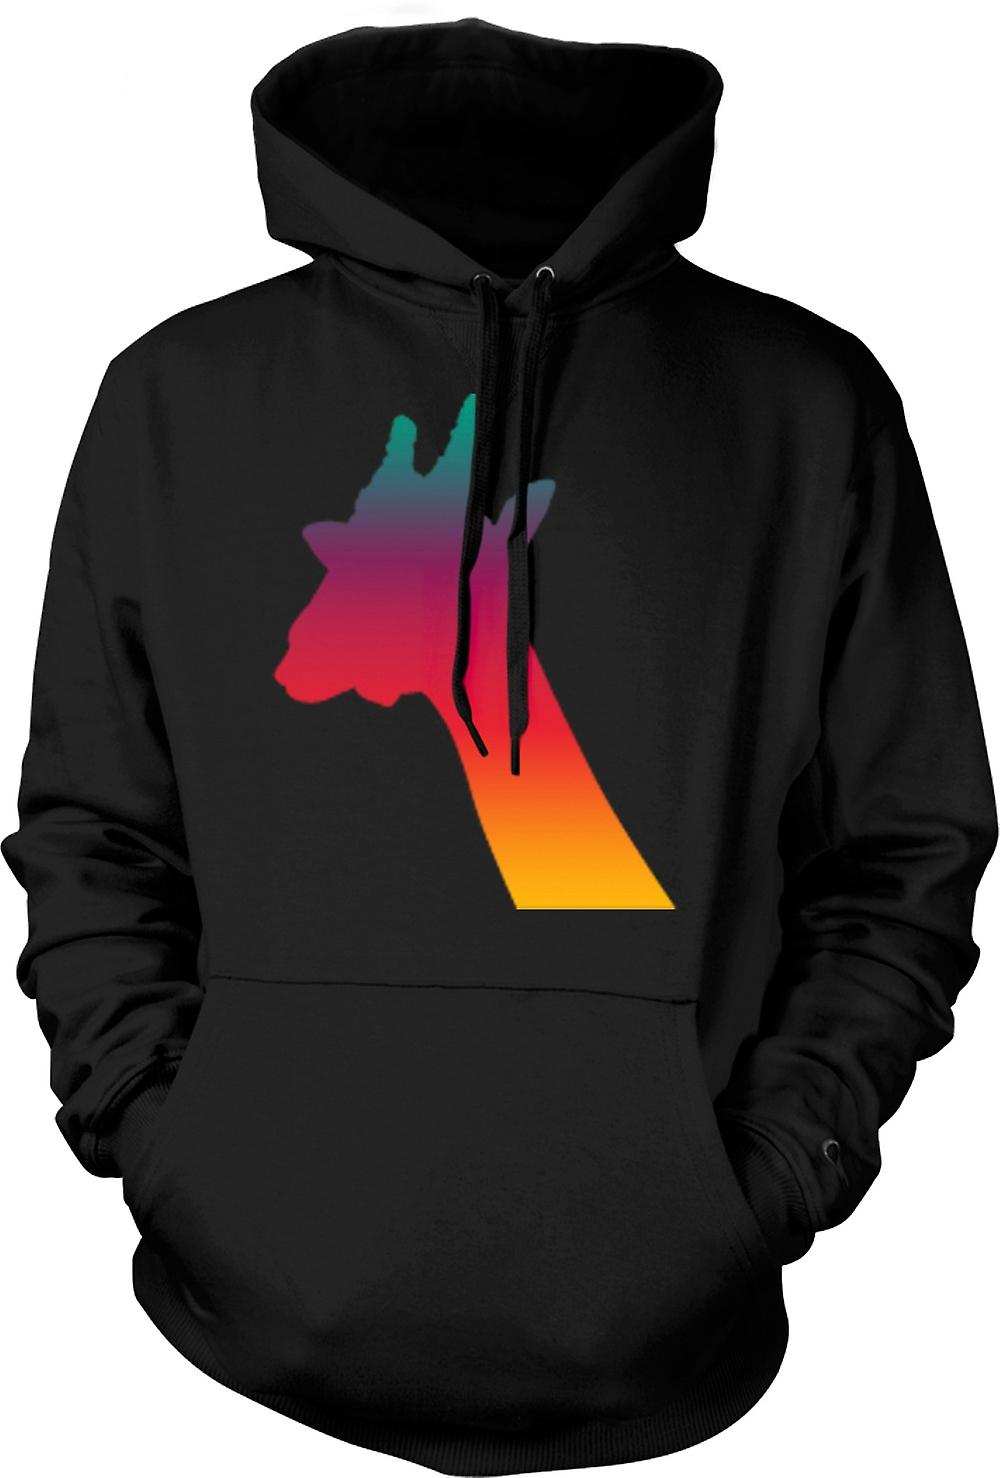 Mens Hoodie - Rainbow Giraffe-Psychedelic-Design